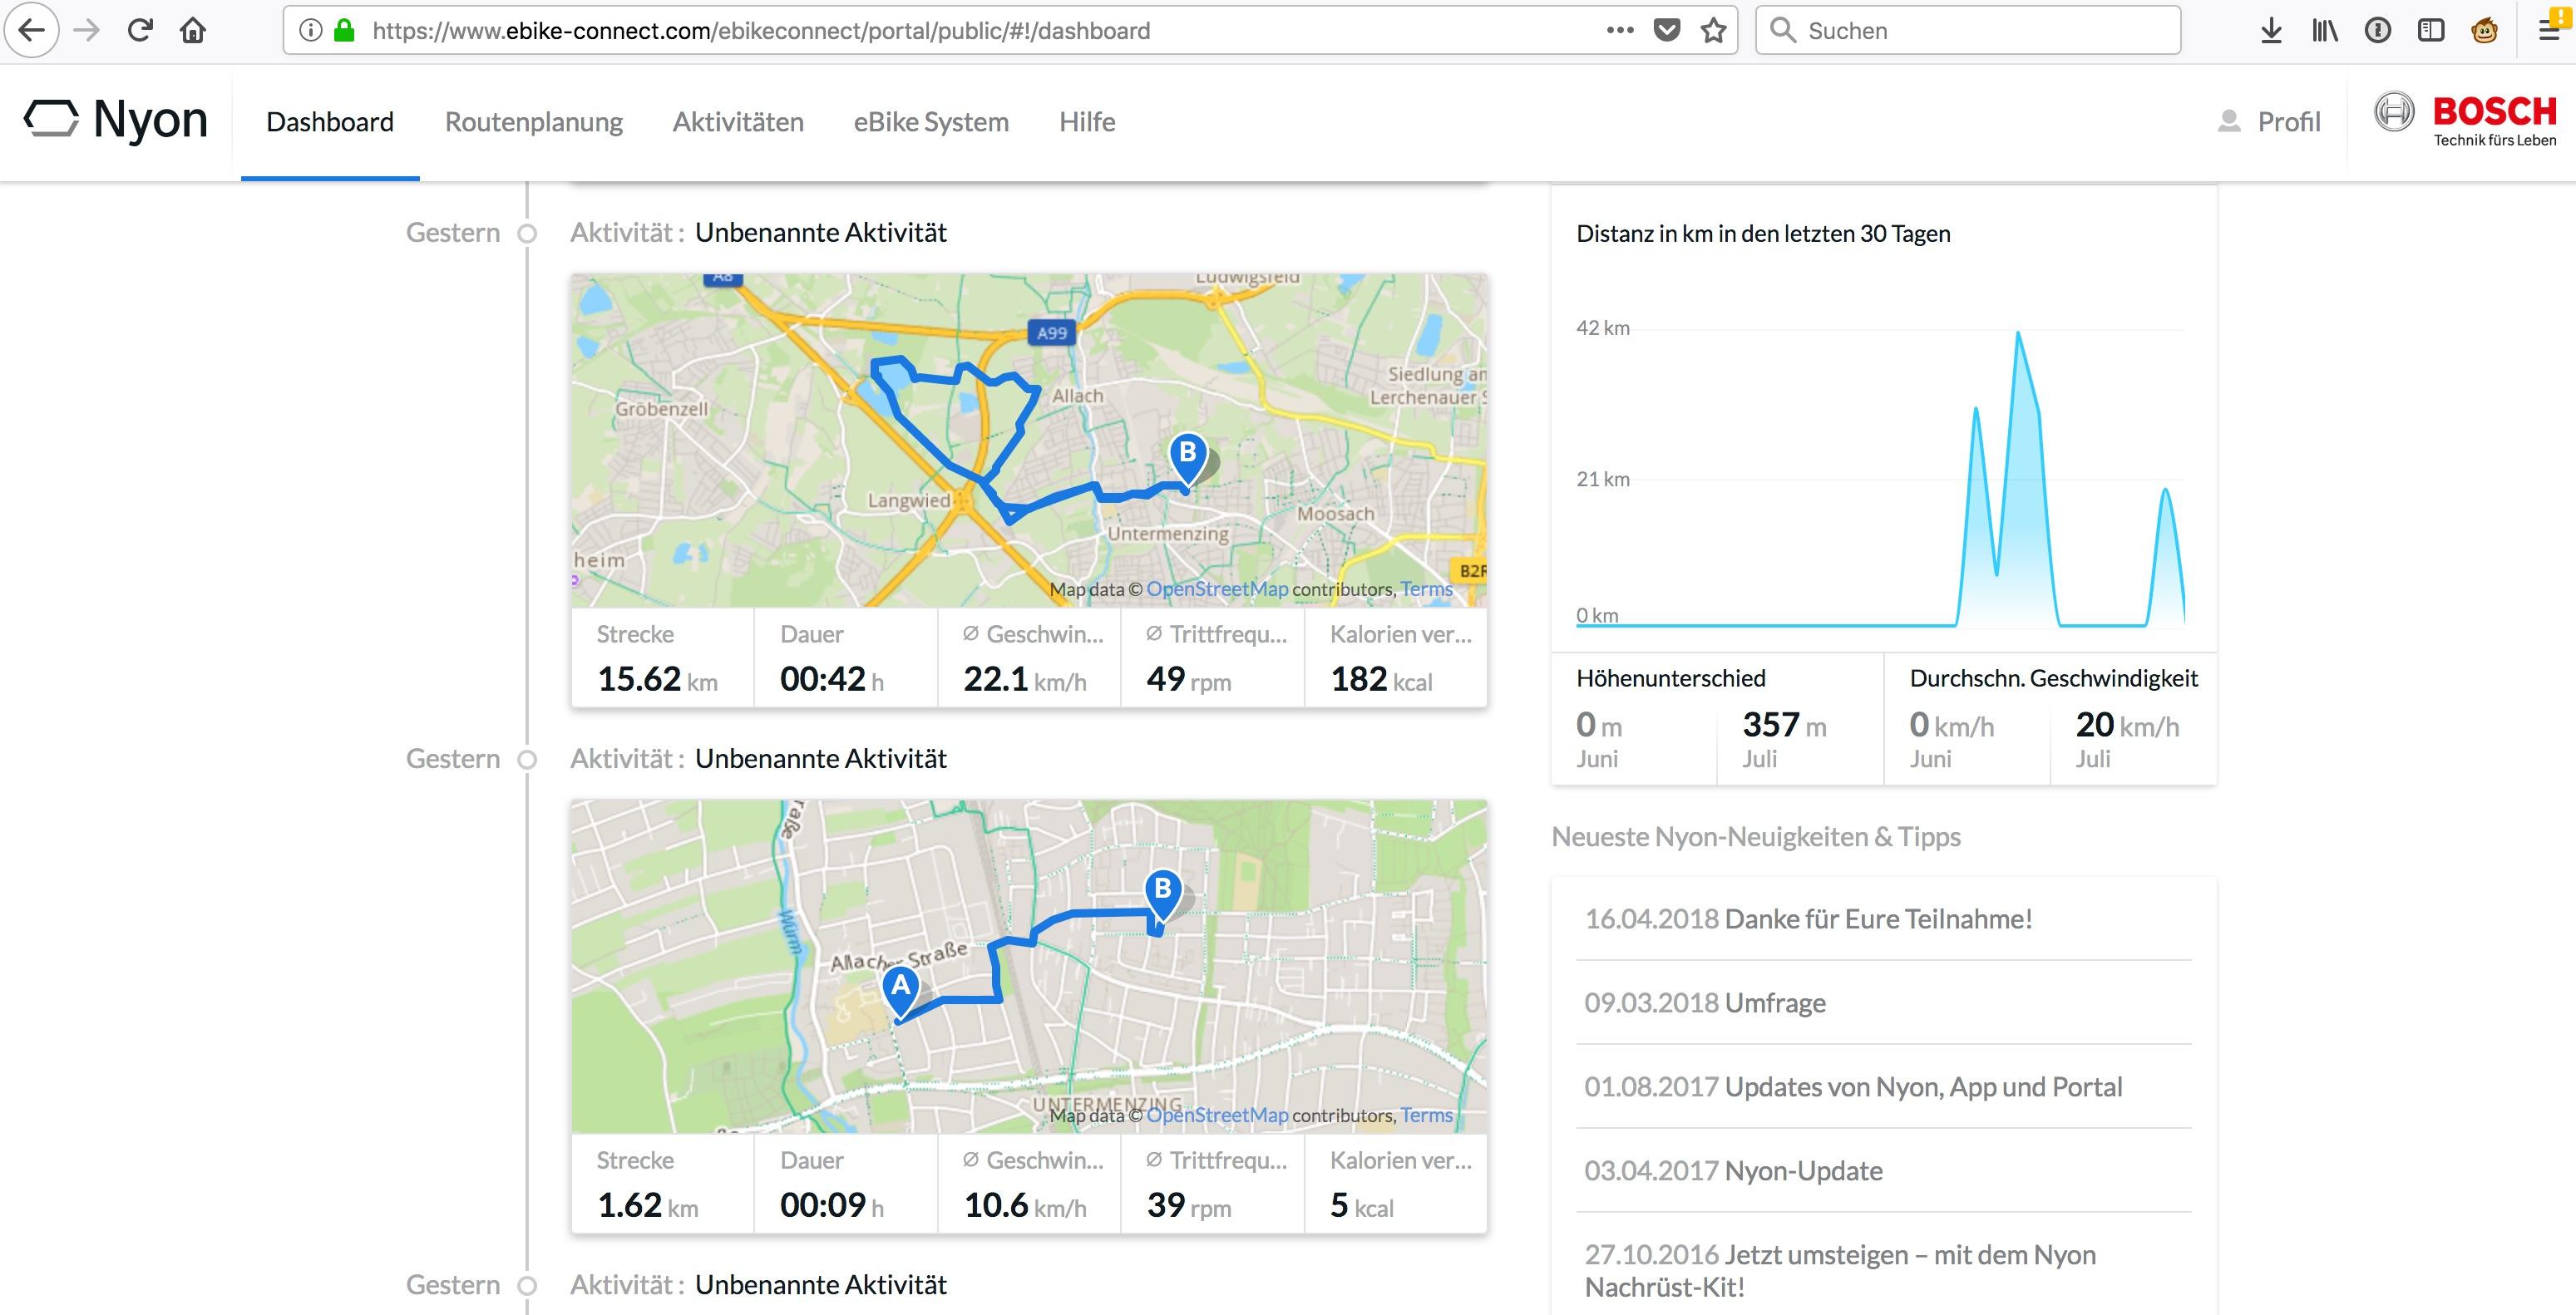 Bosch_eBike_Connect